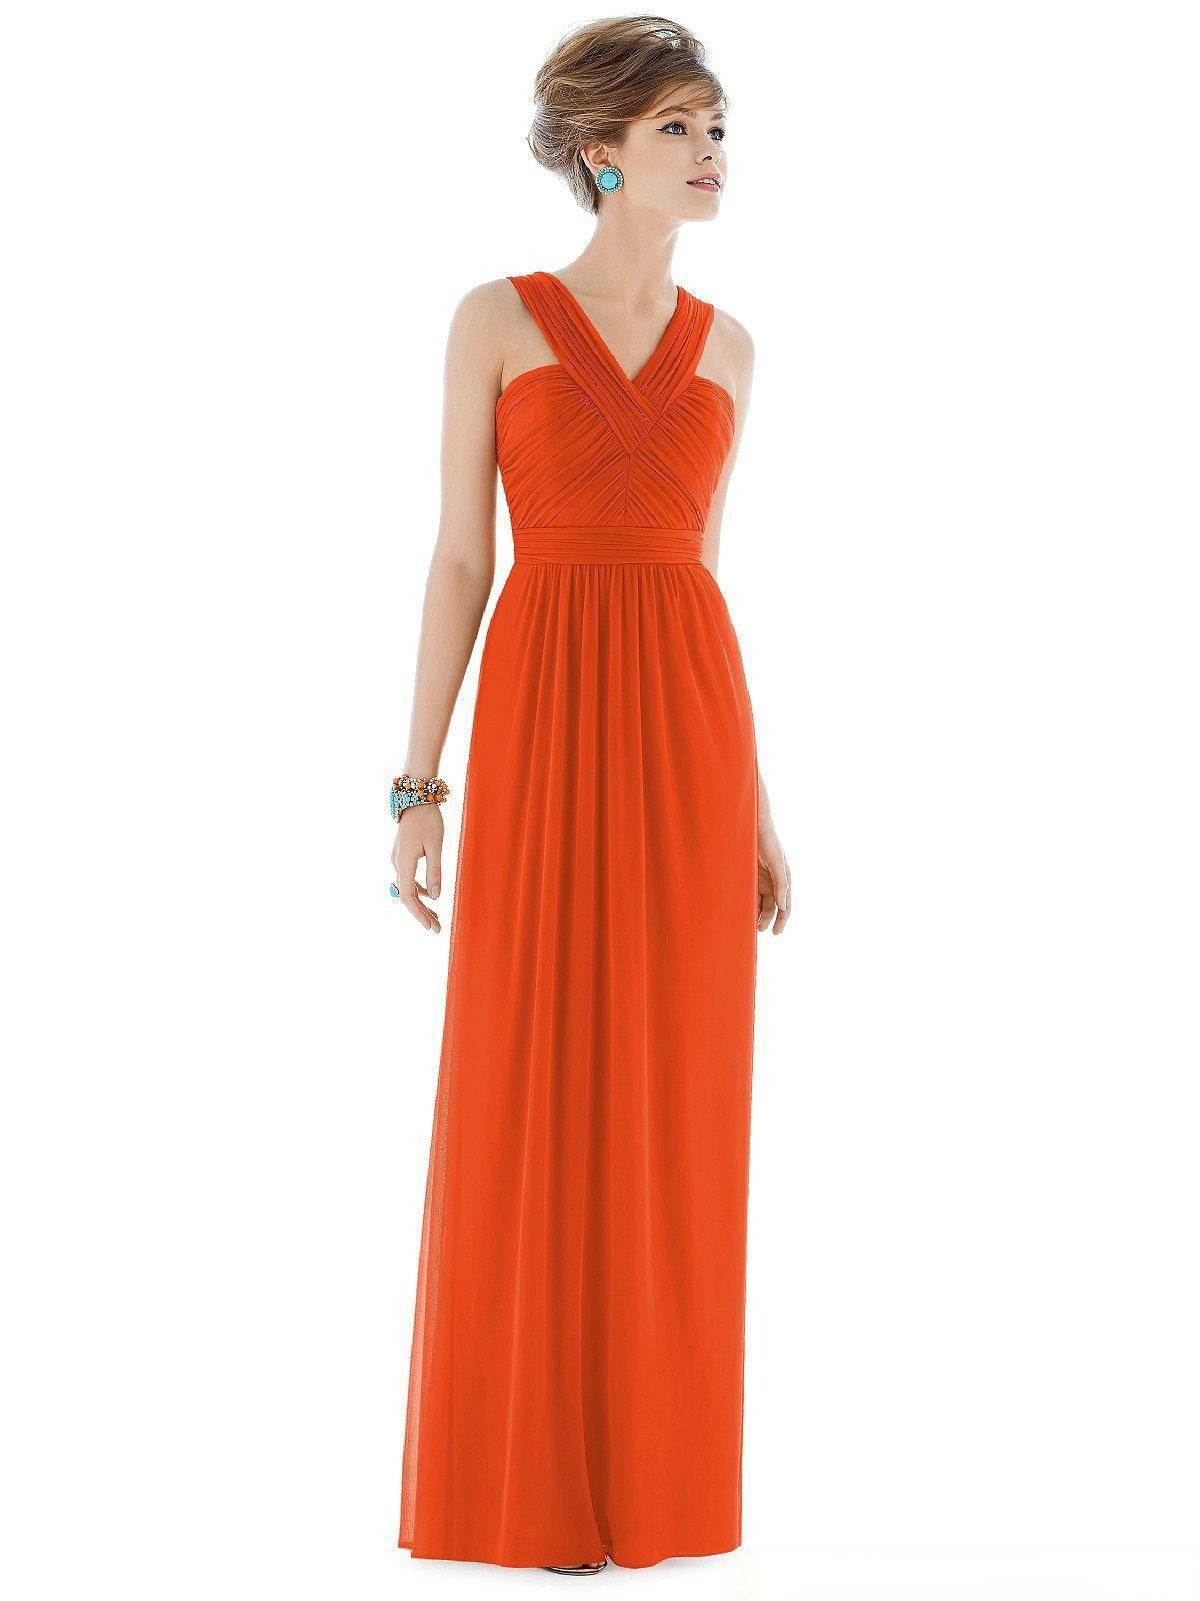 Burnt orange dress plus size  Alfred Sung Tangerine Tango Bridesmaids Dresses  Plus Size Cheap